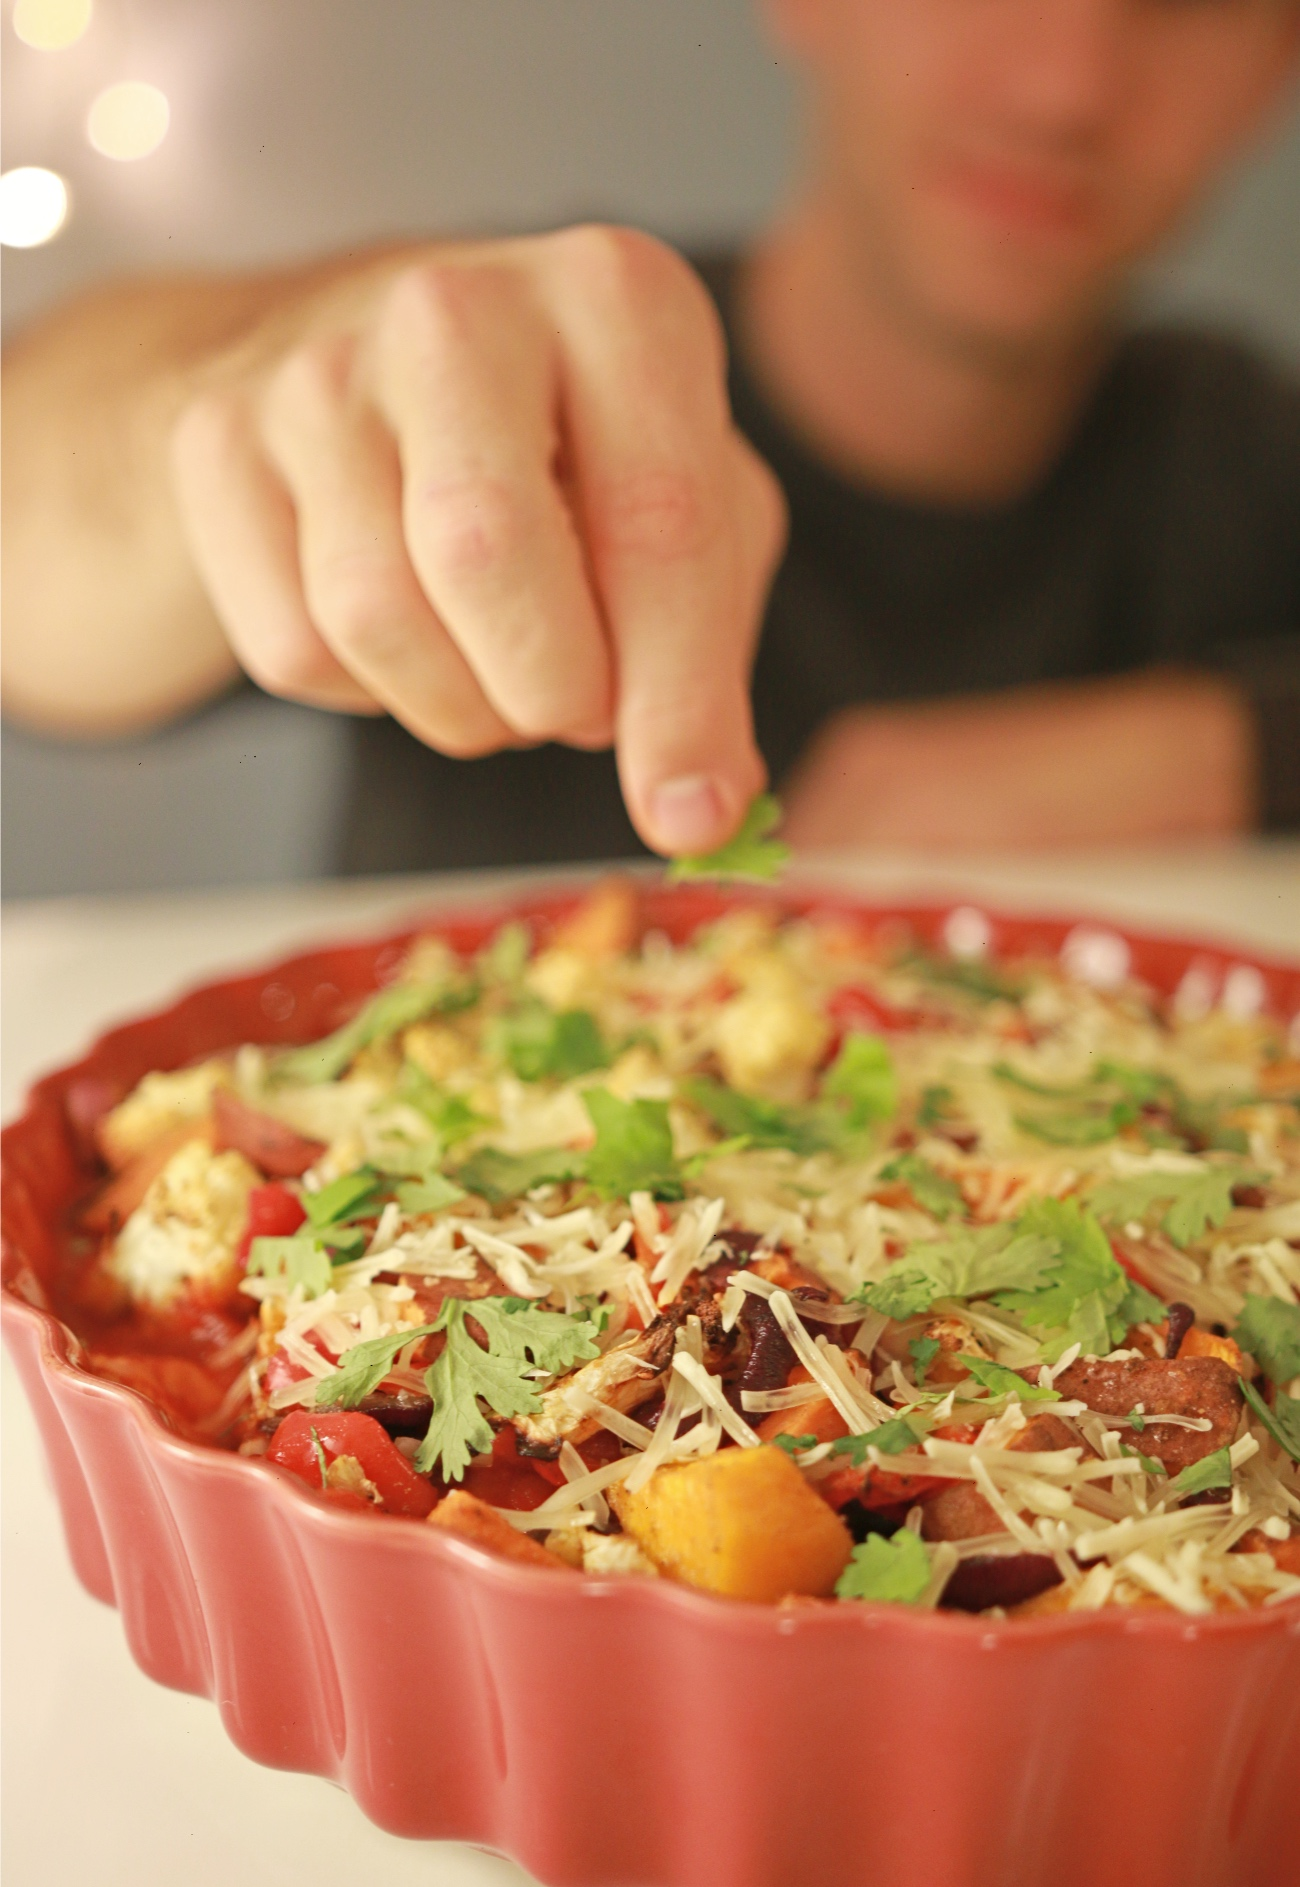 groente casserole - makkelijke ovenschotel